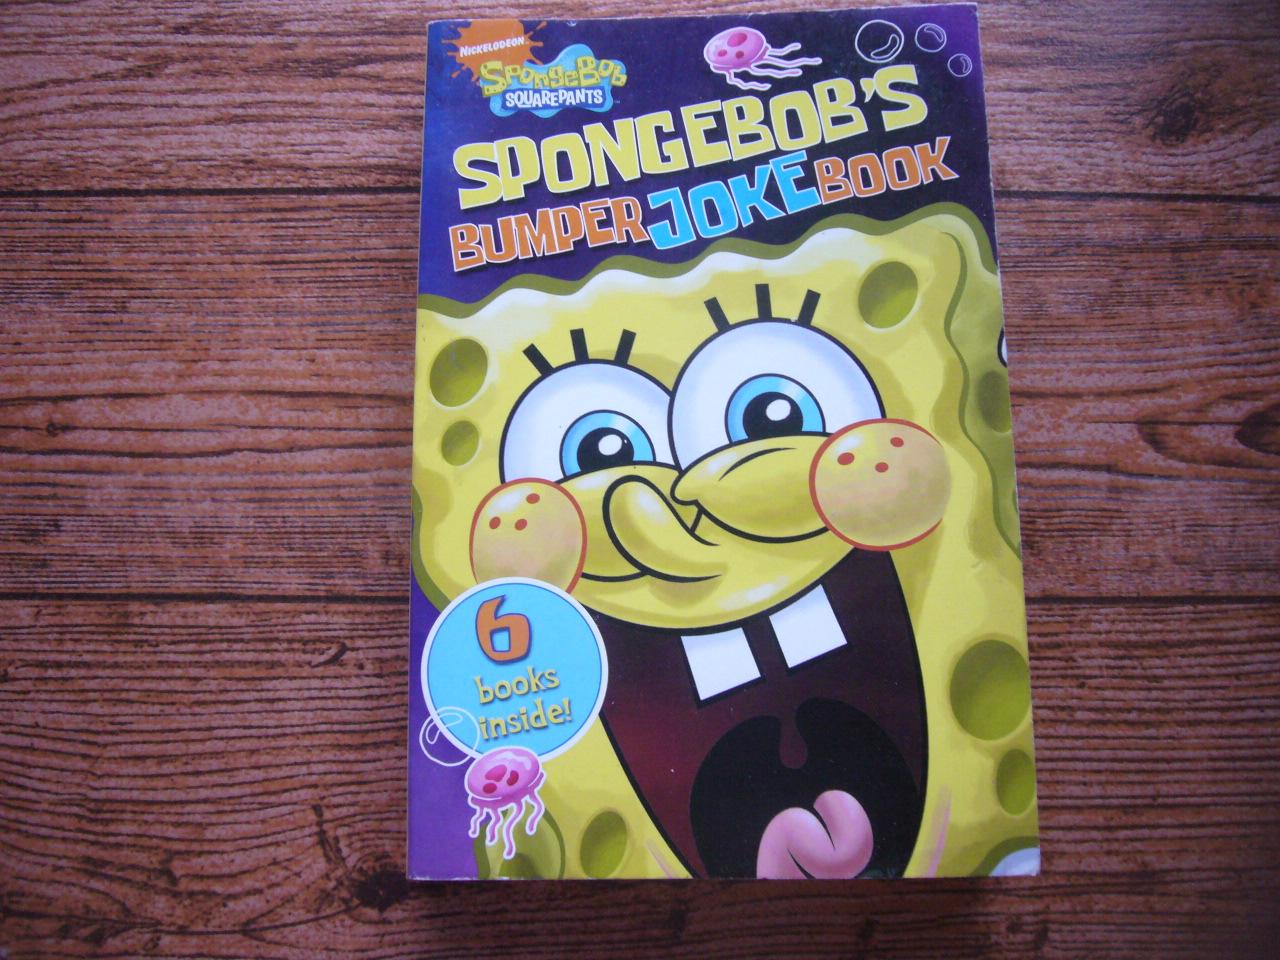 SpongeBob's Bumper Joke Book